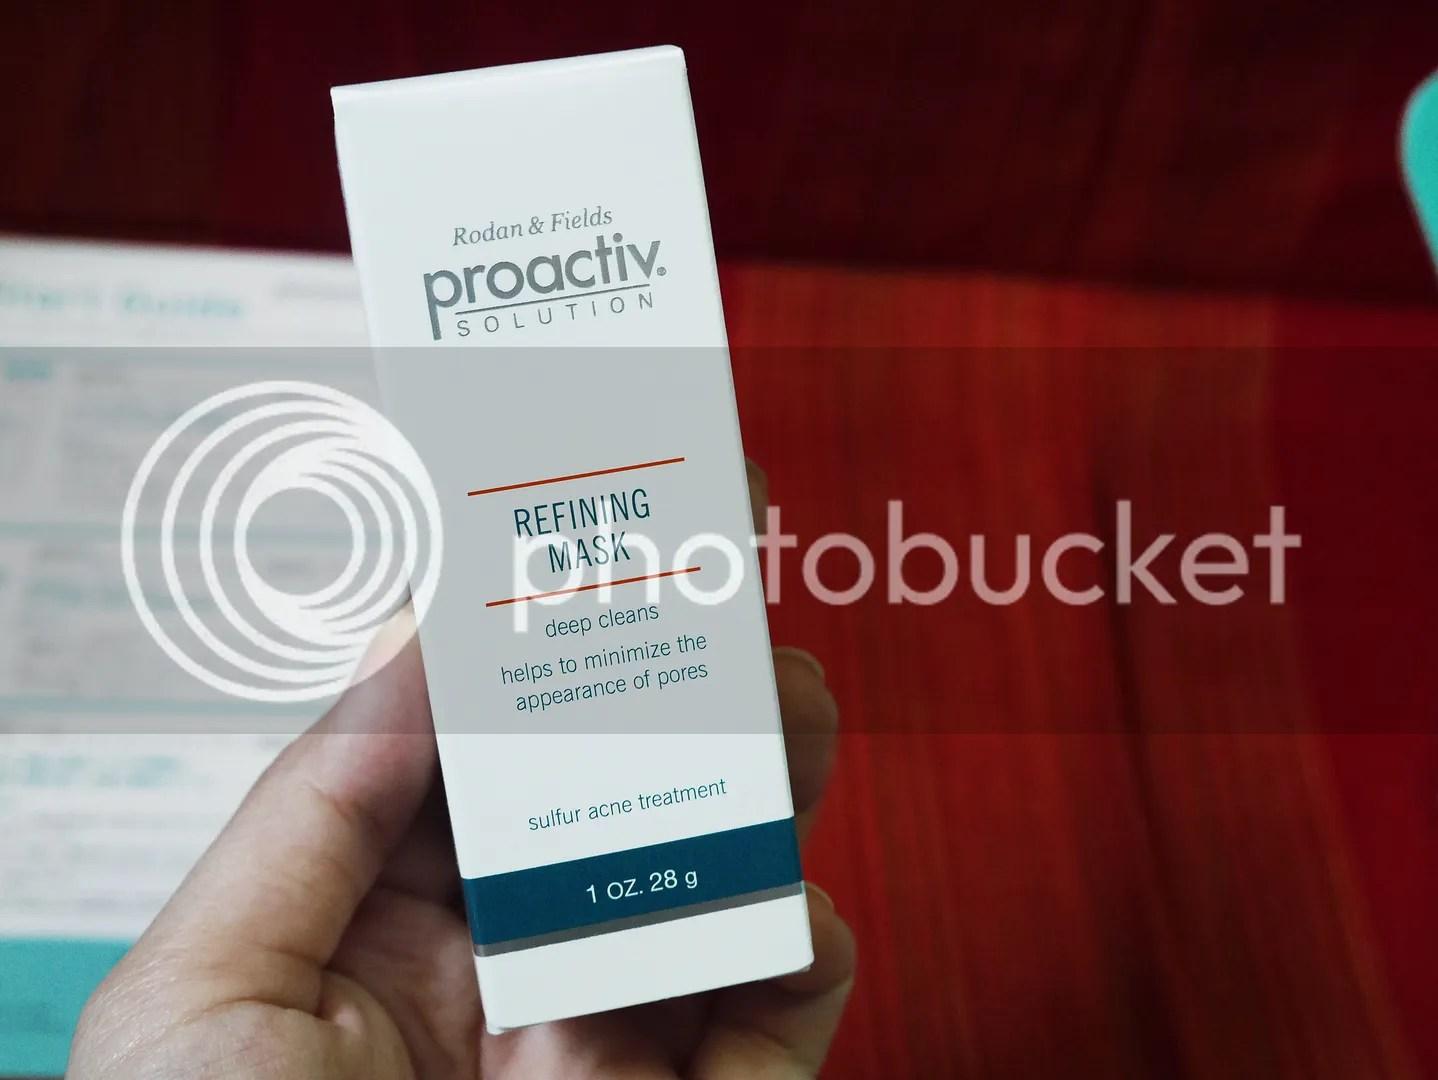 Proactiv Japan Skincare - Blackbox SG [Viktoria Jean] 8